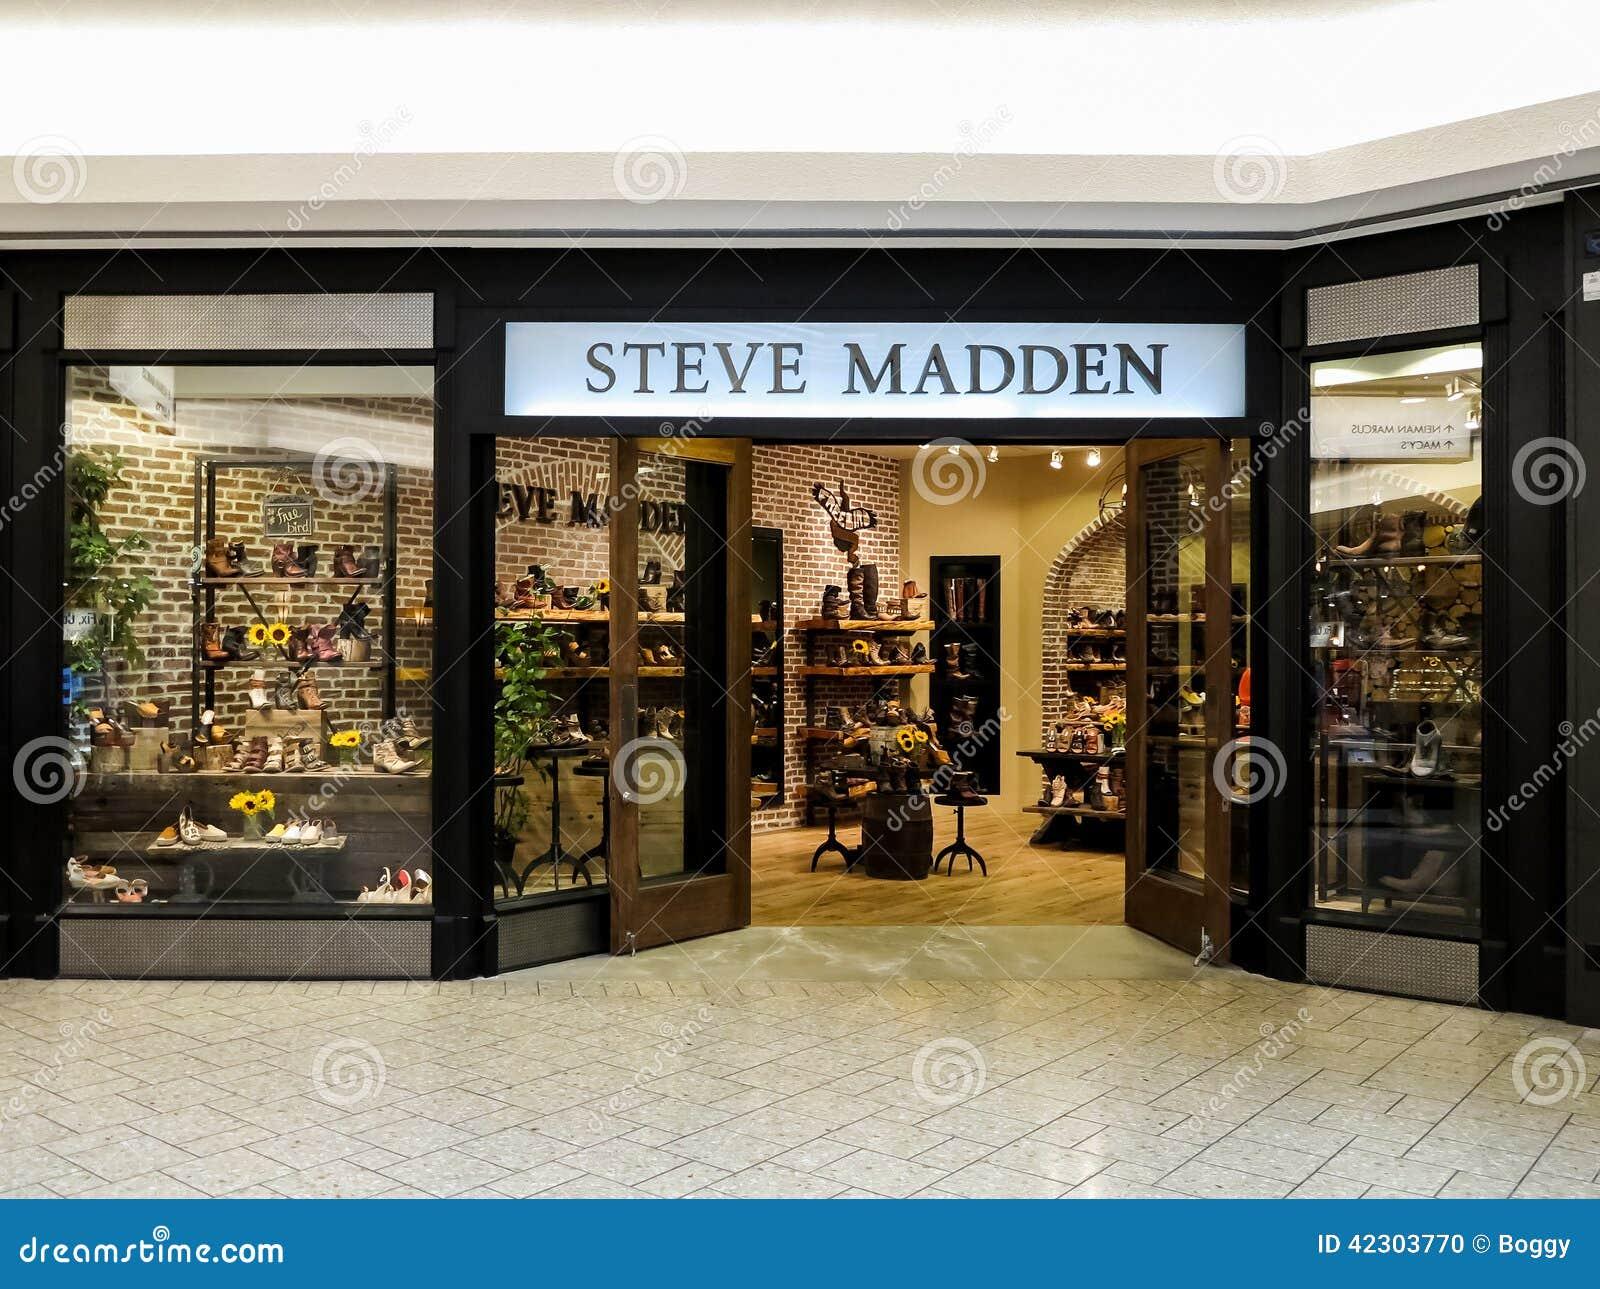 94cef942b14 Steve madden outlet